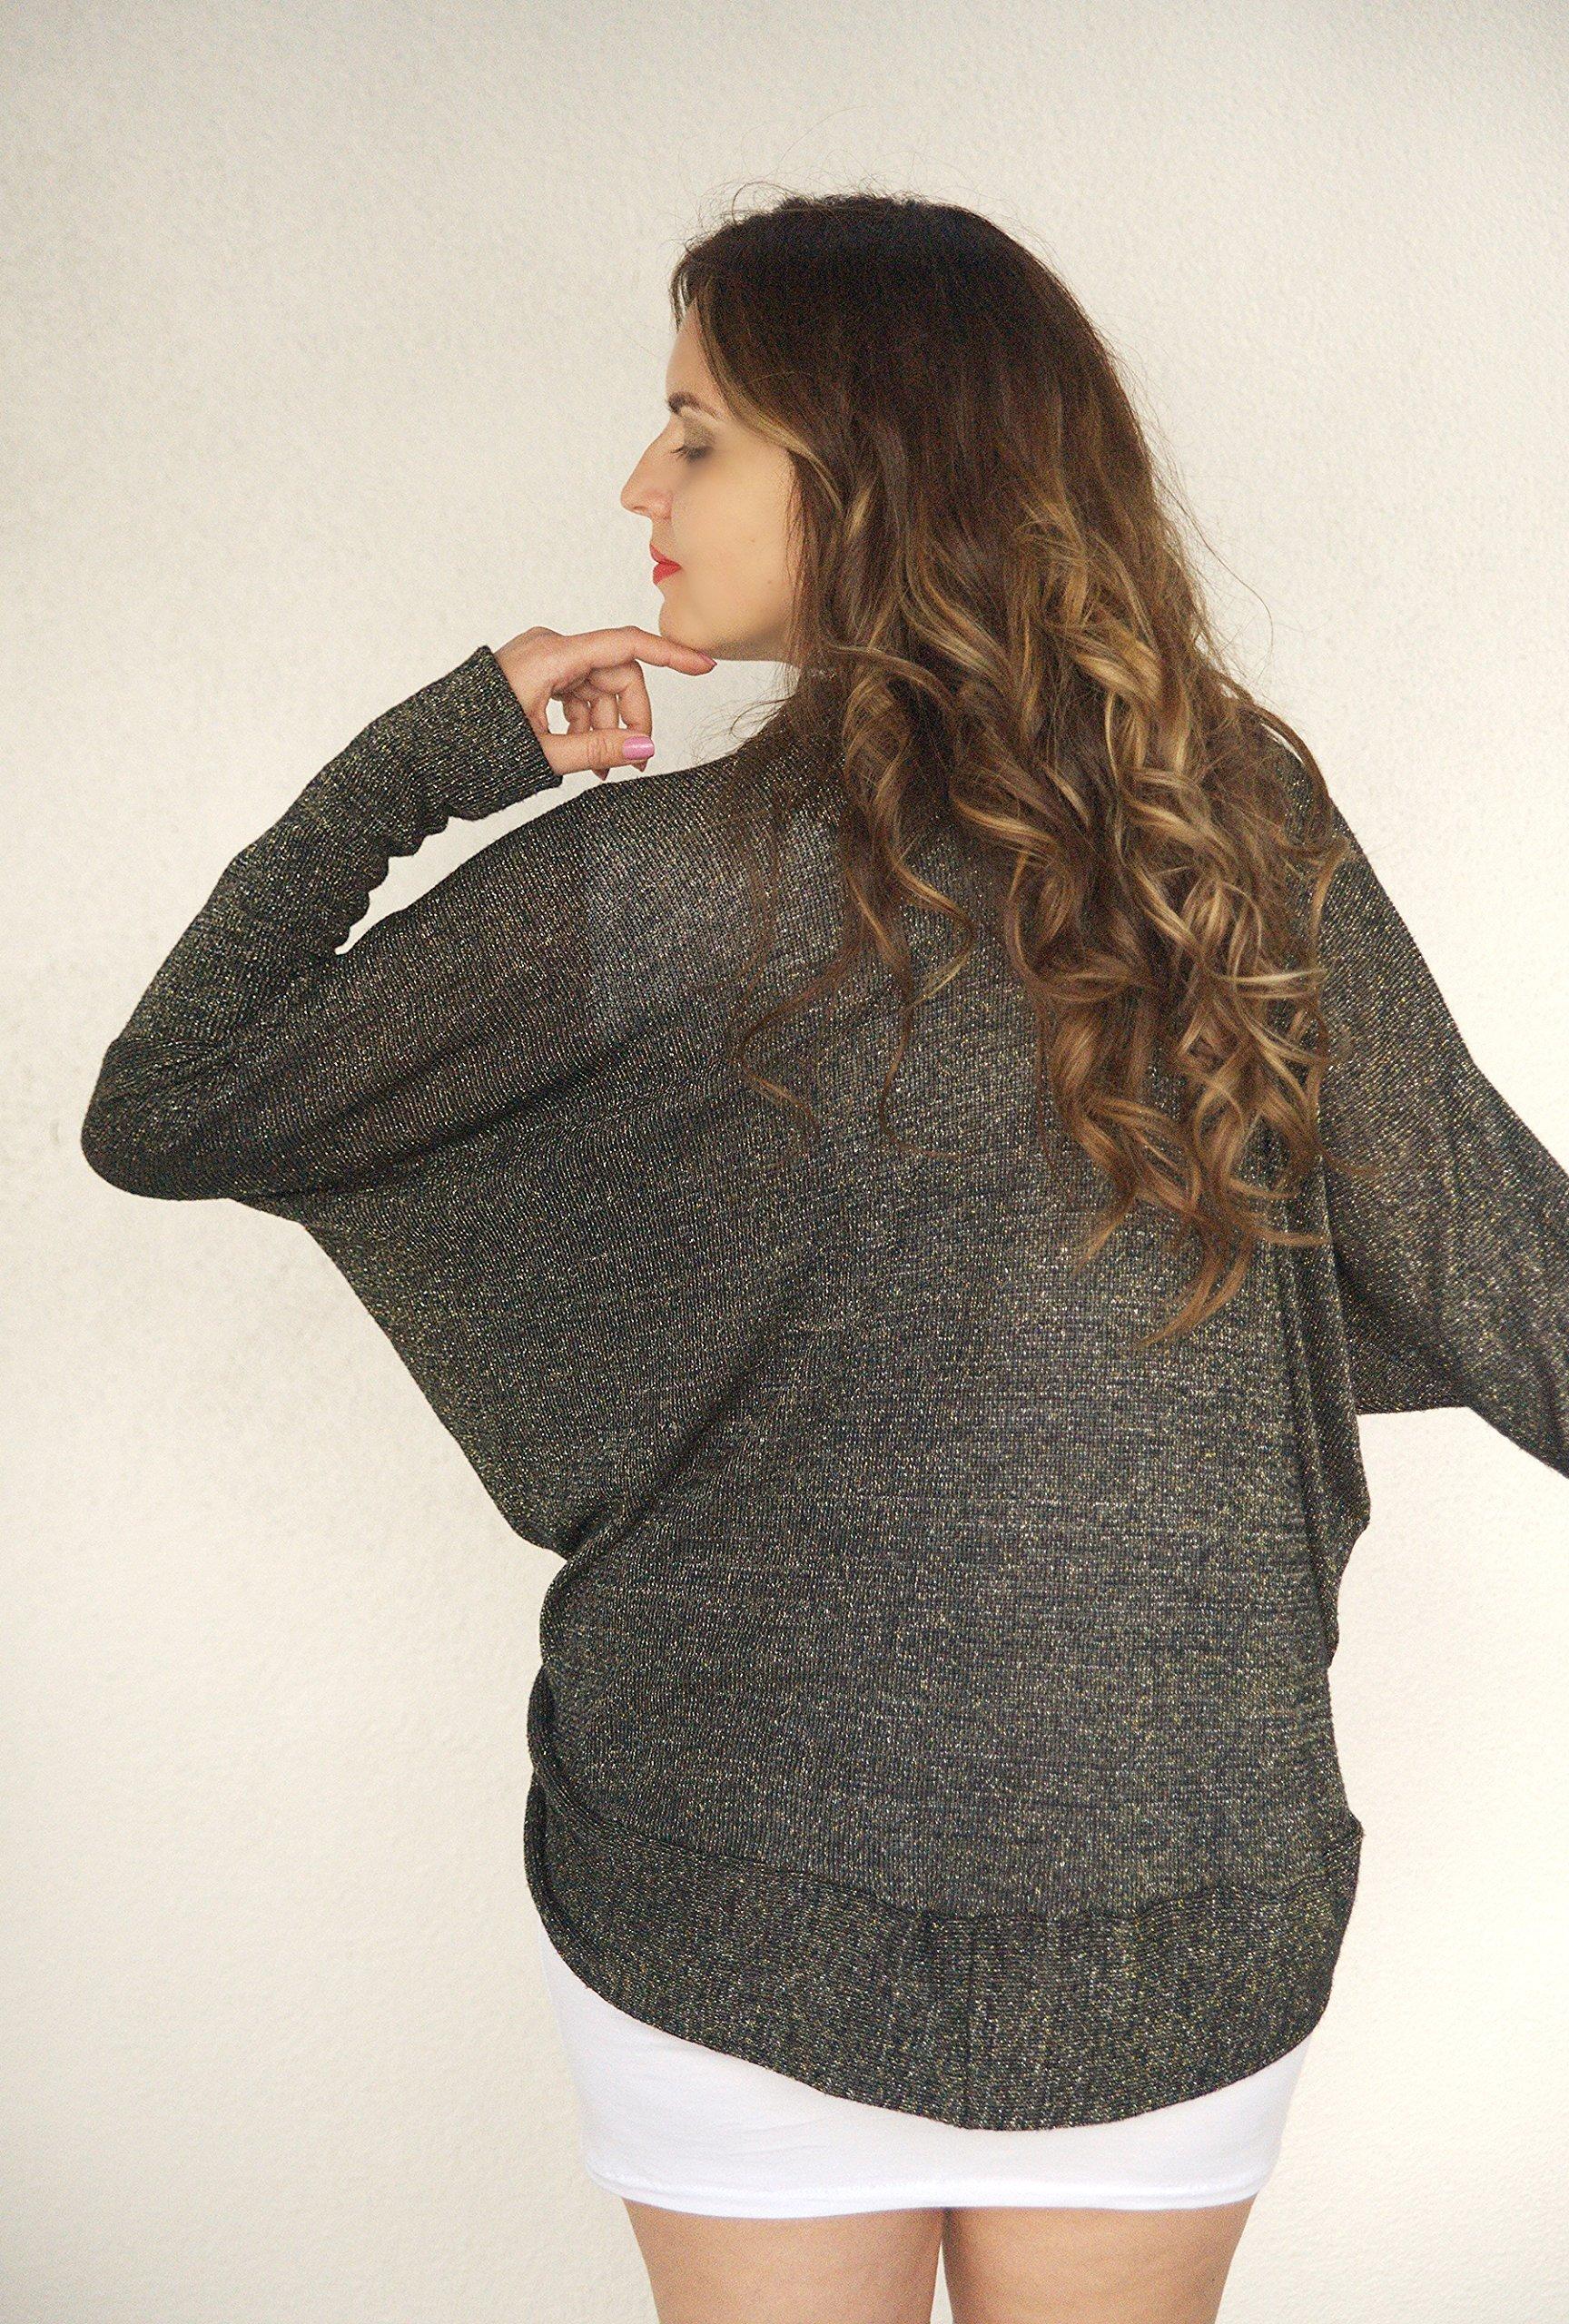 Super Cozy Black Gold Silver Shawl Kimono Cardigan, Metallic Sweater, Street Kimono, Special Occasion Cardigan Sweater. ONE Size (S-XL)